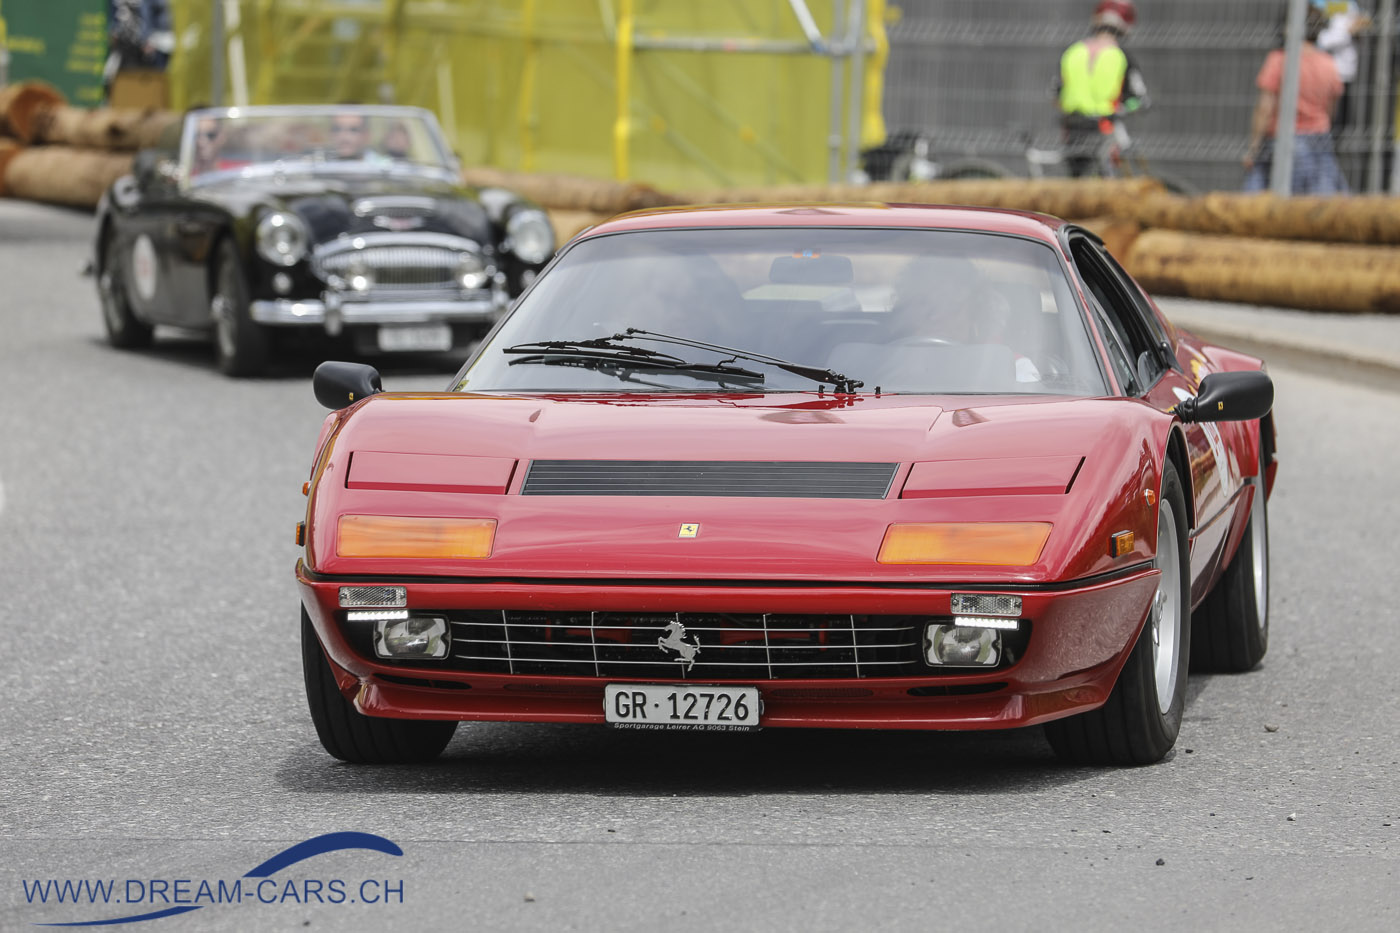 Lenzerheide Motor Classics, 14. bis 16. Juni 2019. Ein Ferrari 512 BB der Dorfgruppe